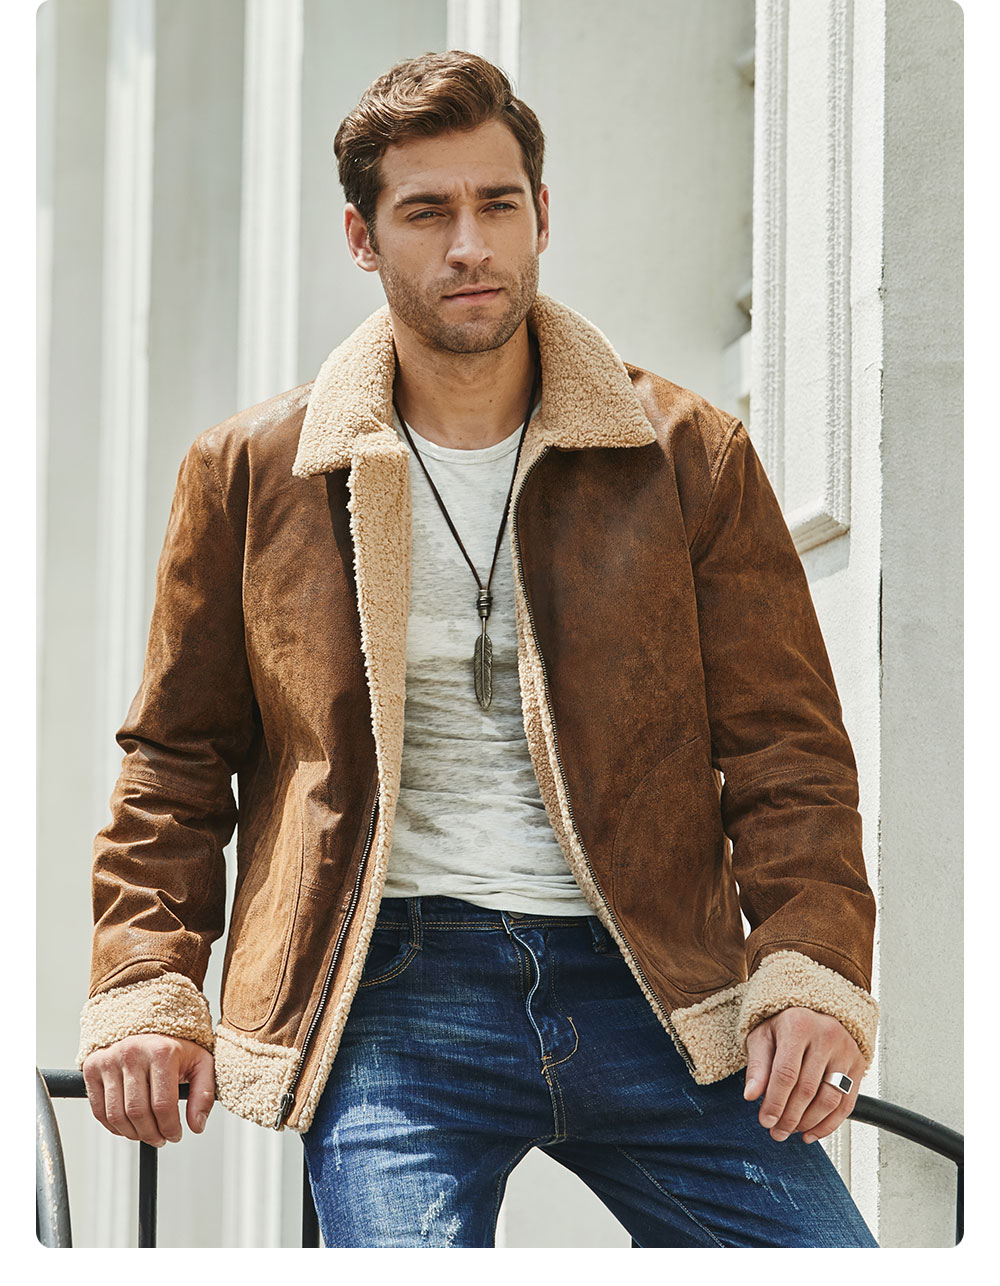 H15b5755be91545f7a0ce21c150d1f935X New Men's Real Leather Jacket Faux Fur Collar Genuine Leather Jacket